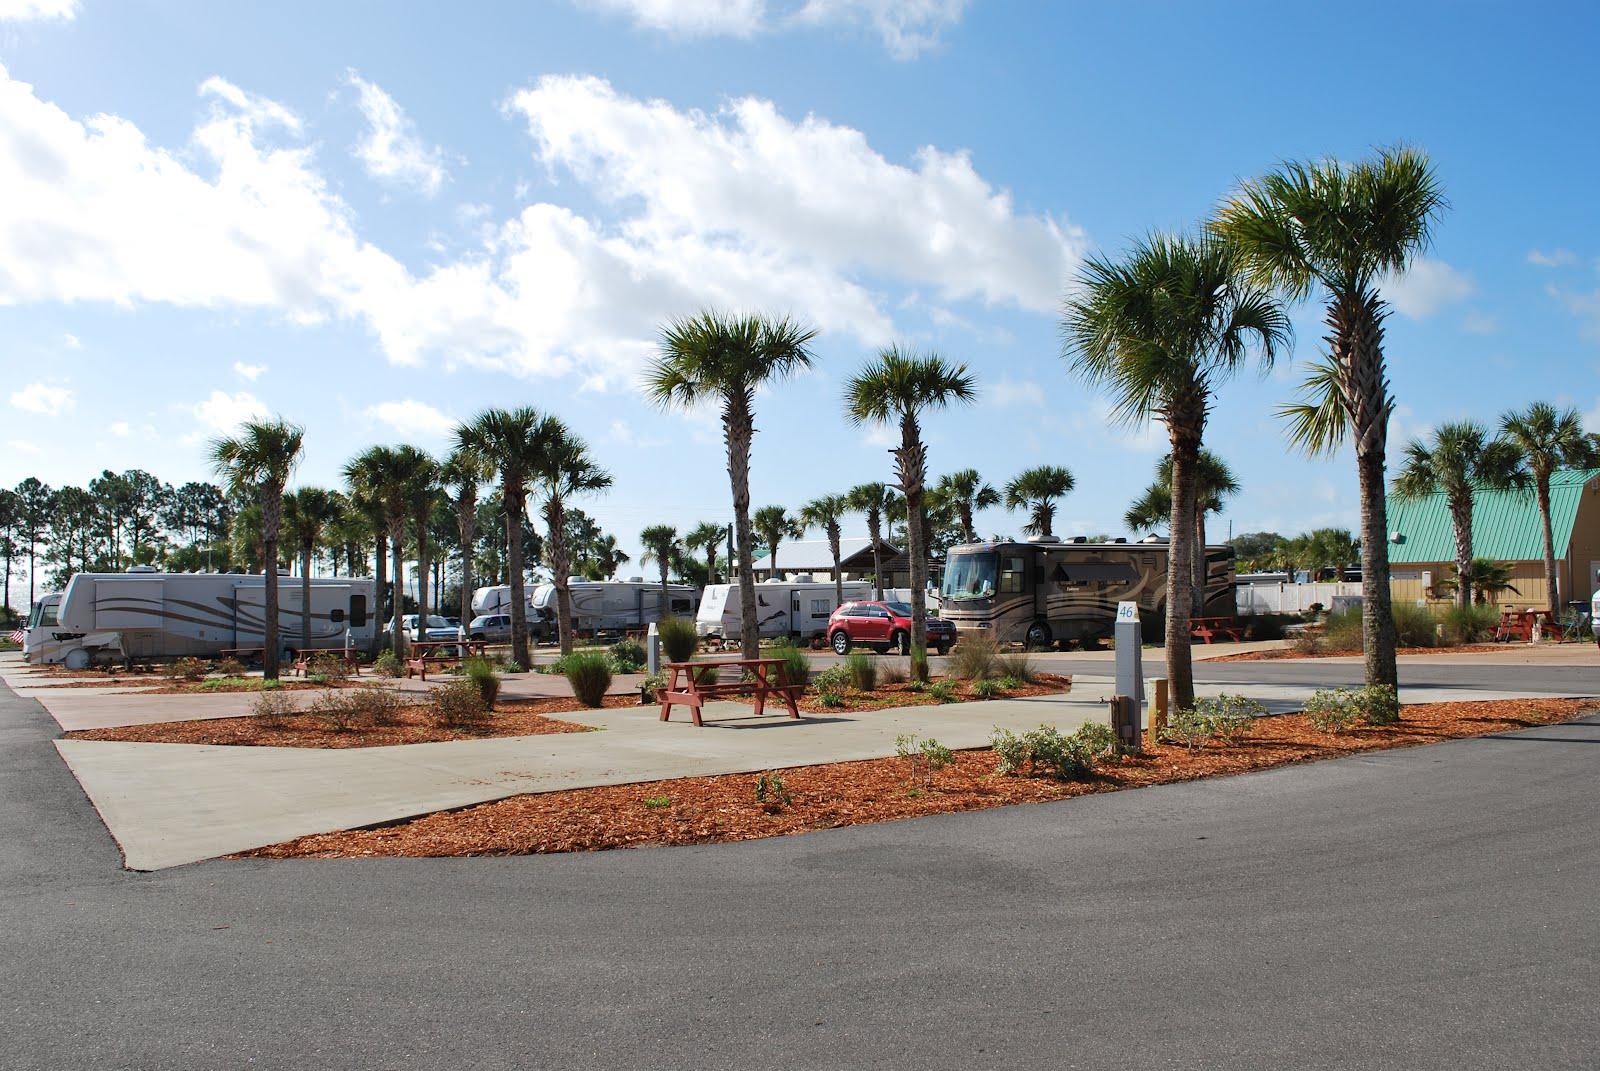 Blue Sky Ahead Carrebelle Beach Rv Resort Carrabelle Fl